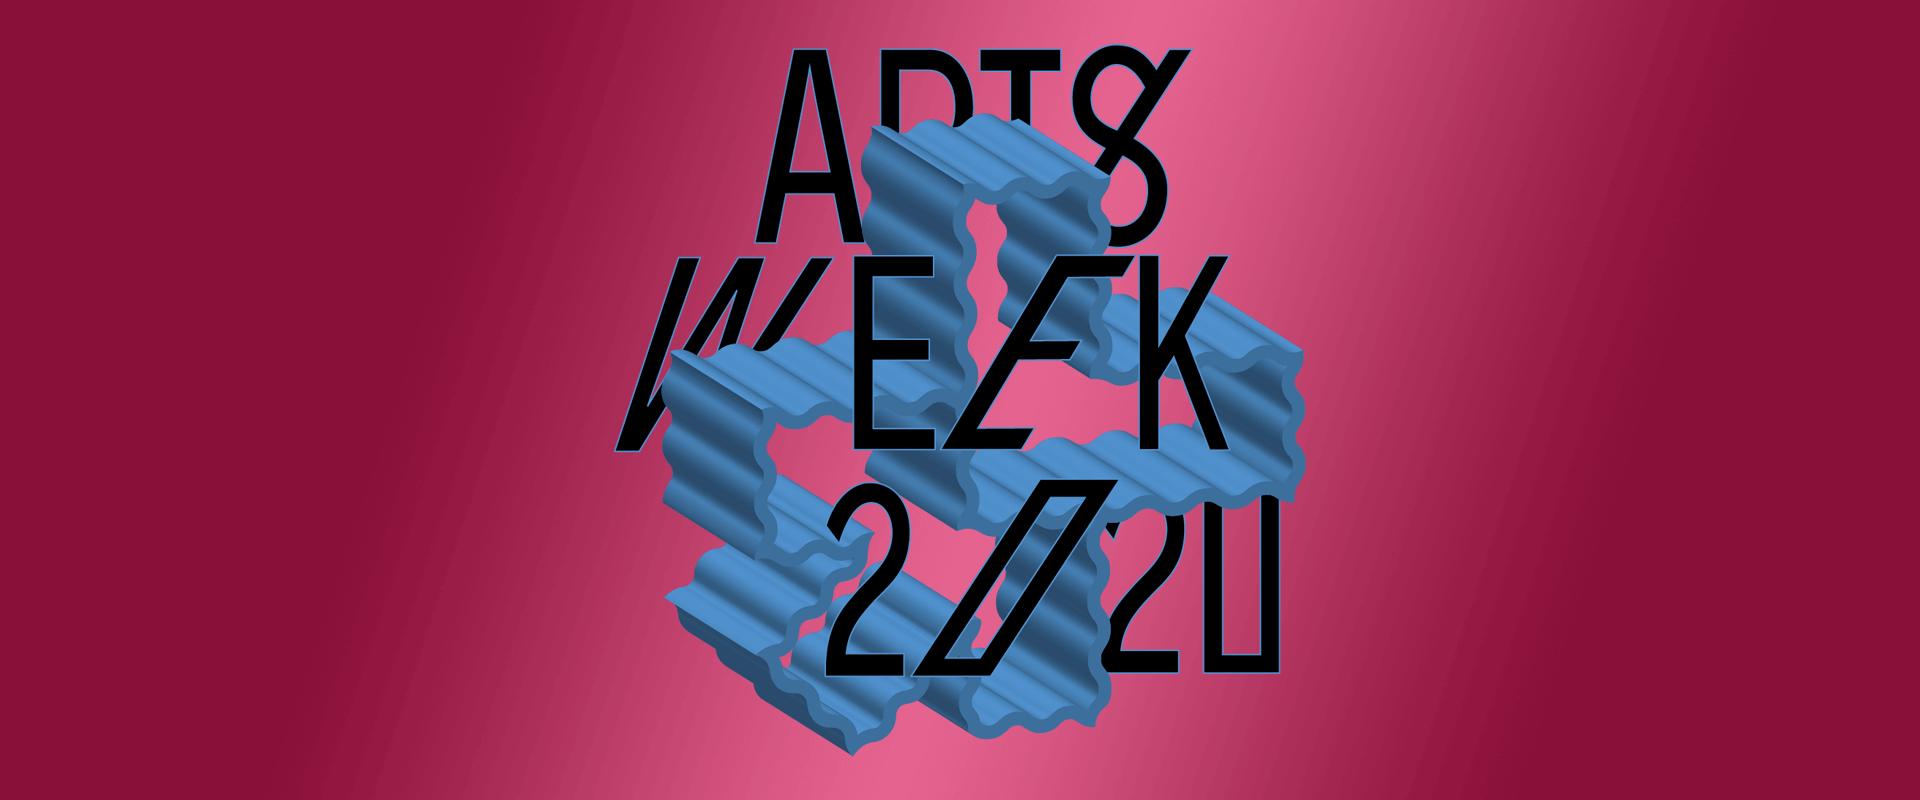 Heforshe arts week 2020